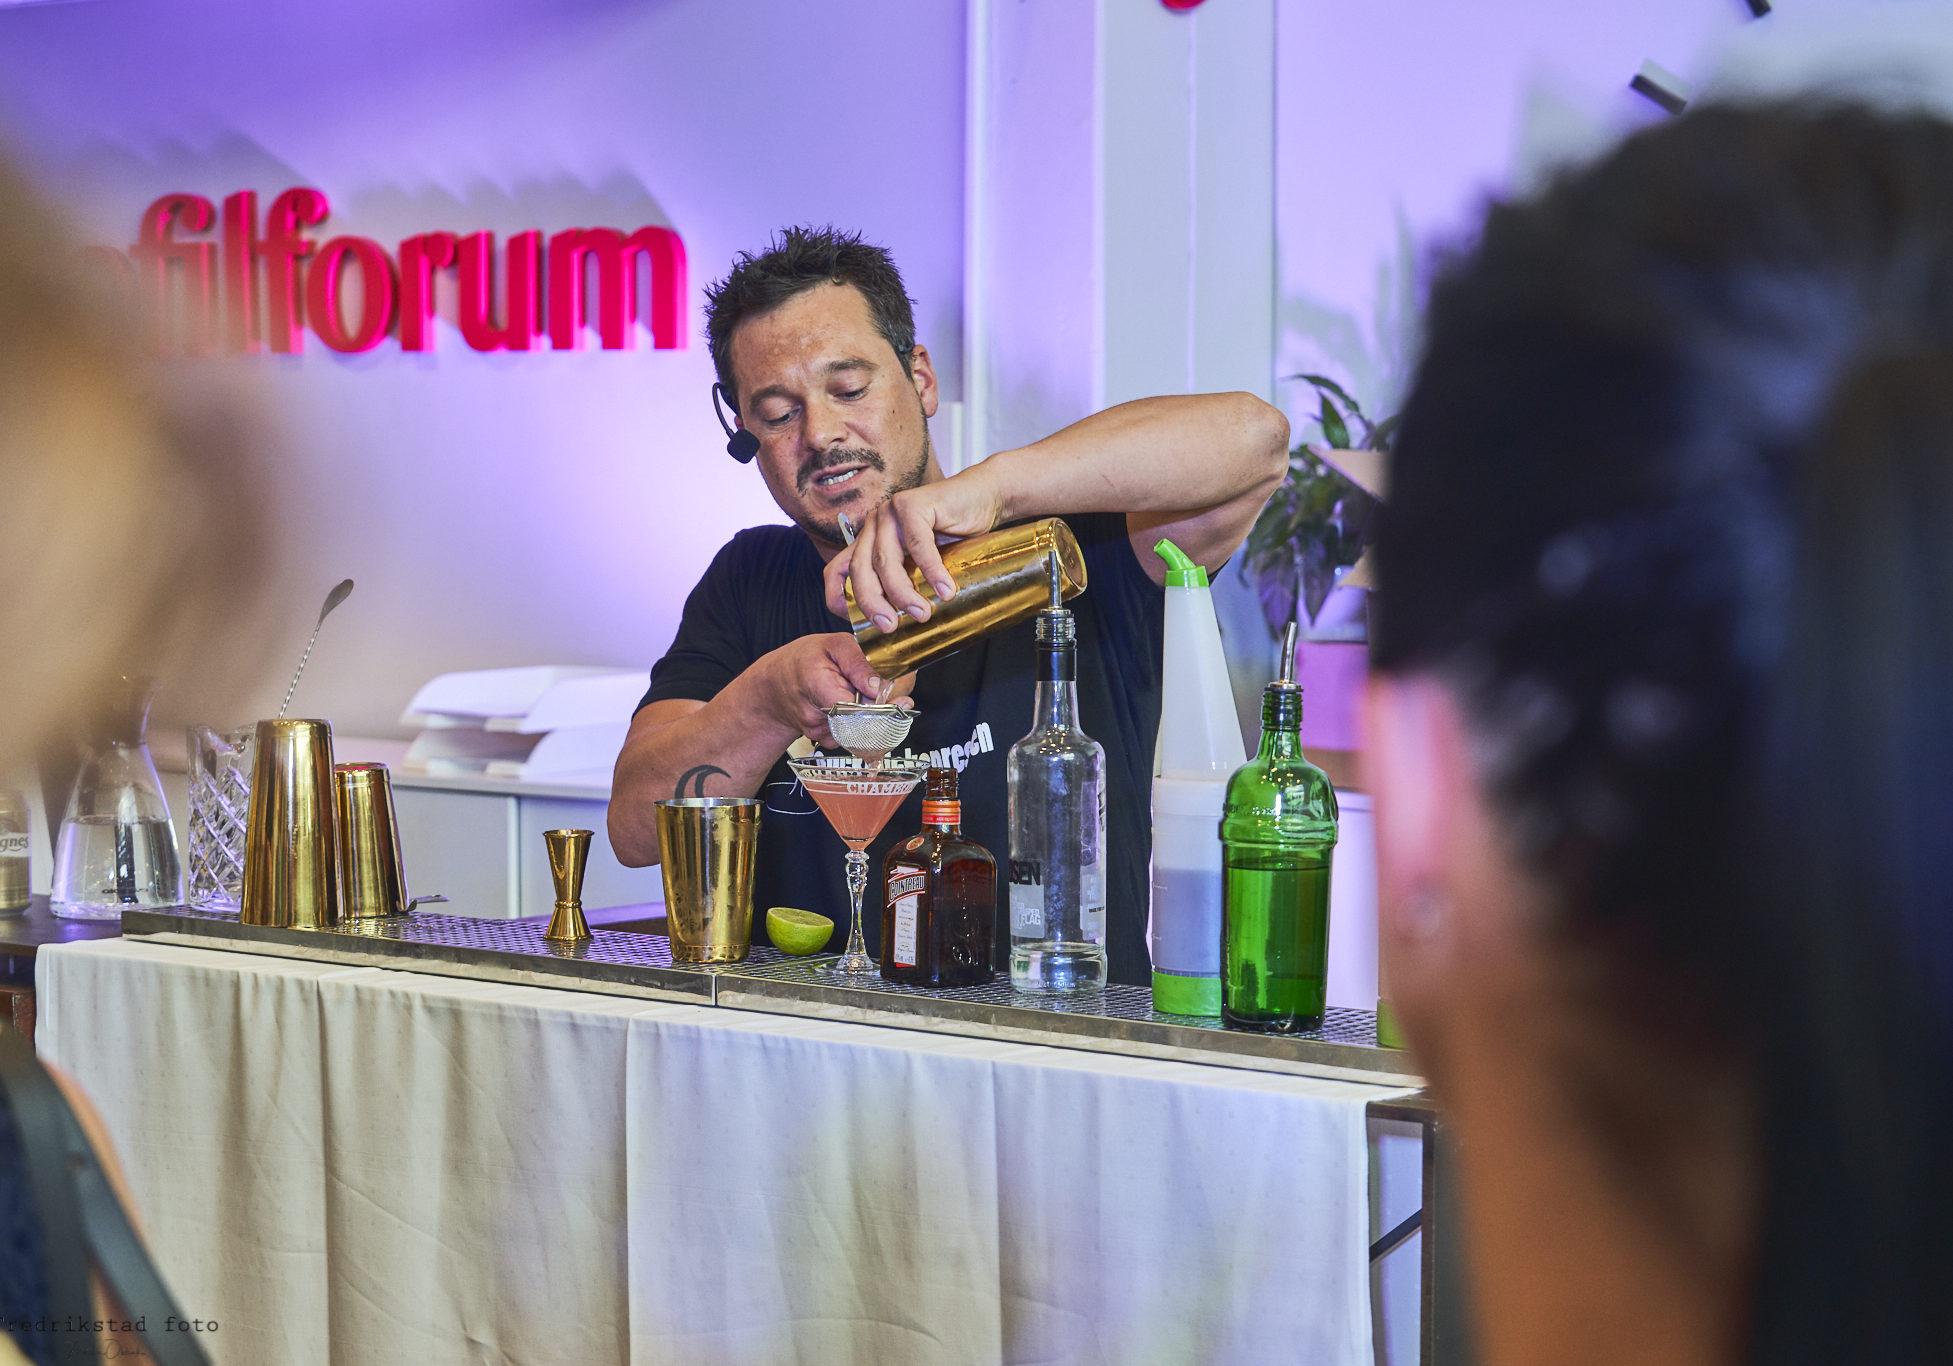 Bartender drinkkurs, event, cocktailkurs, barkurs, drinker, firmafest